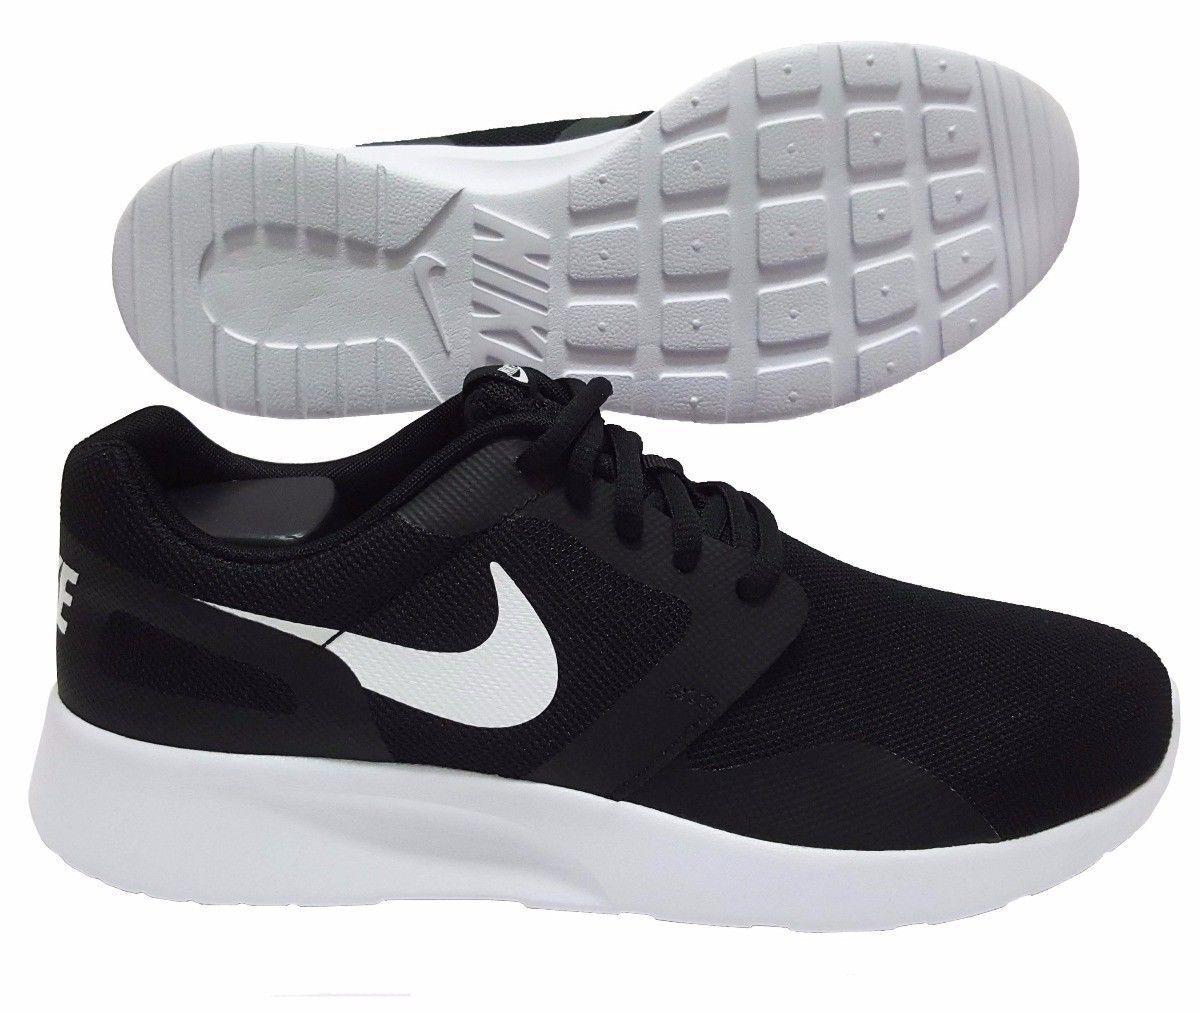 NIB Men's NIKE Tanjun NS Running shoes Sneakers Kaishi Rosche Black 747492 010